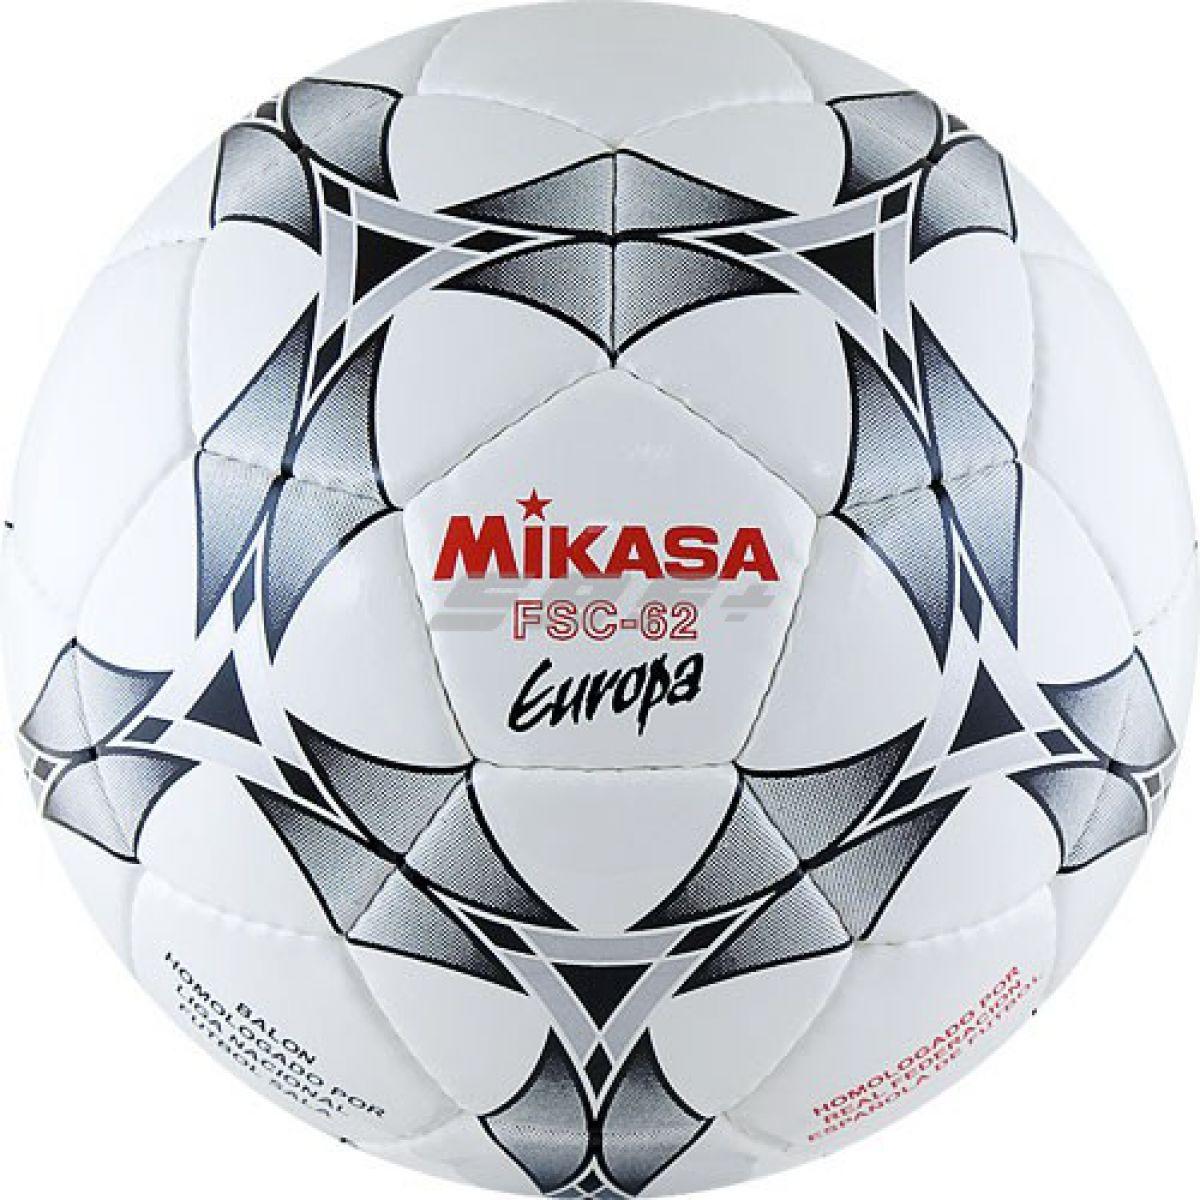 Мяч футзальный MIKASA FSC-62E Europa